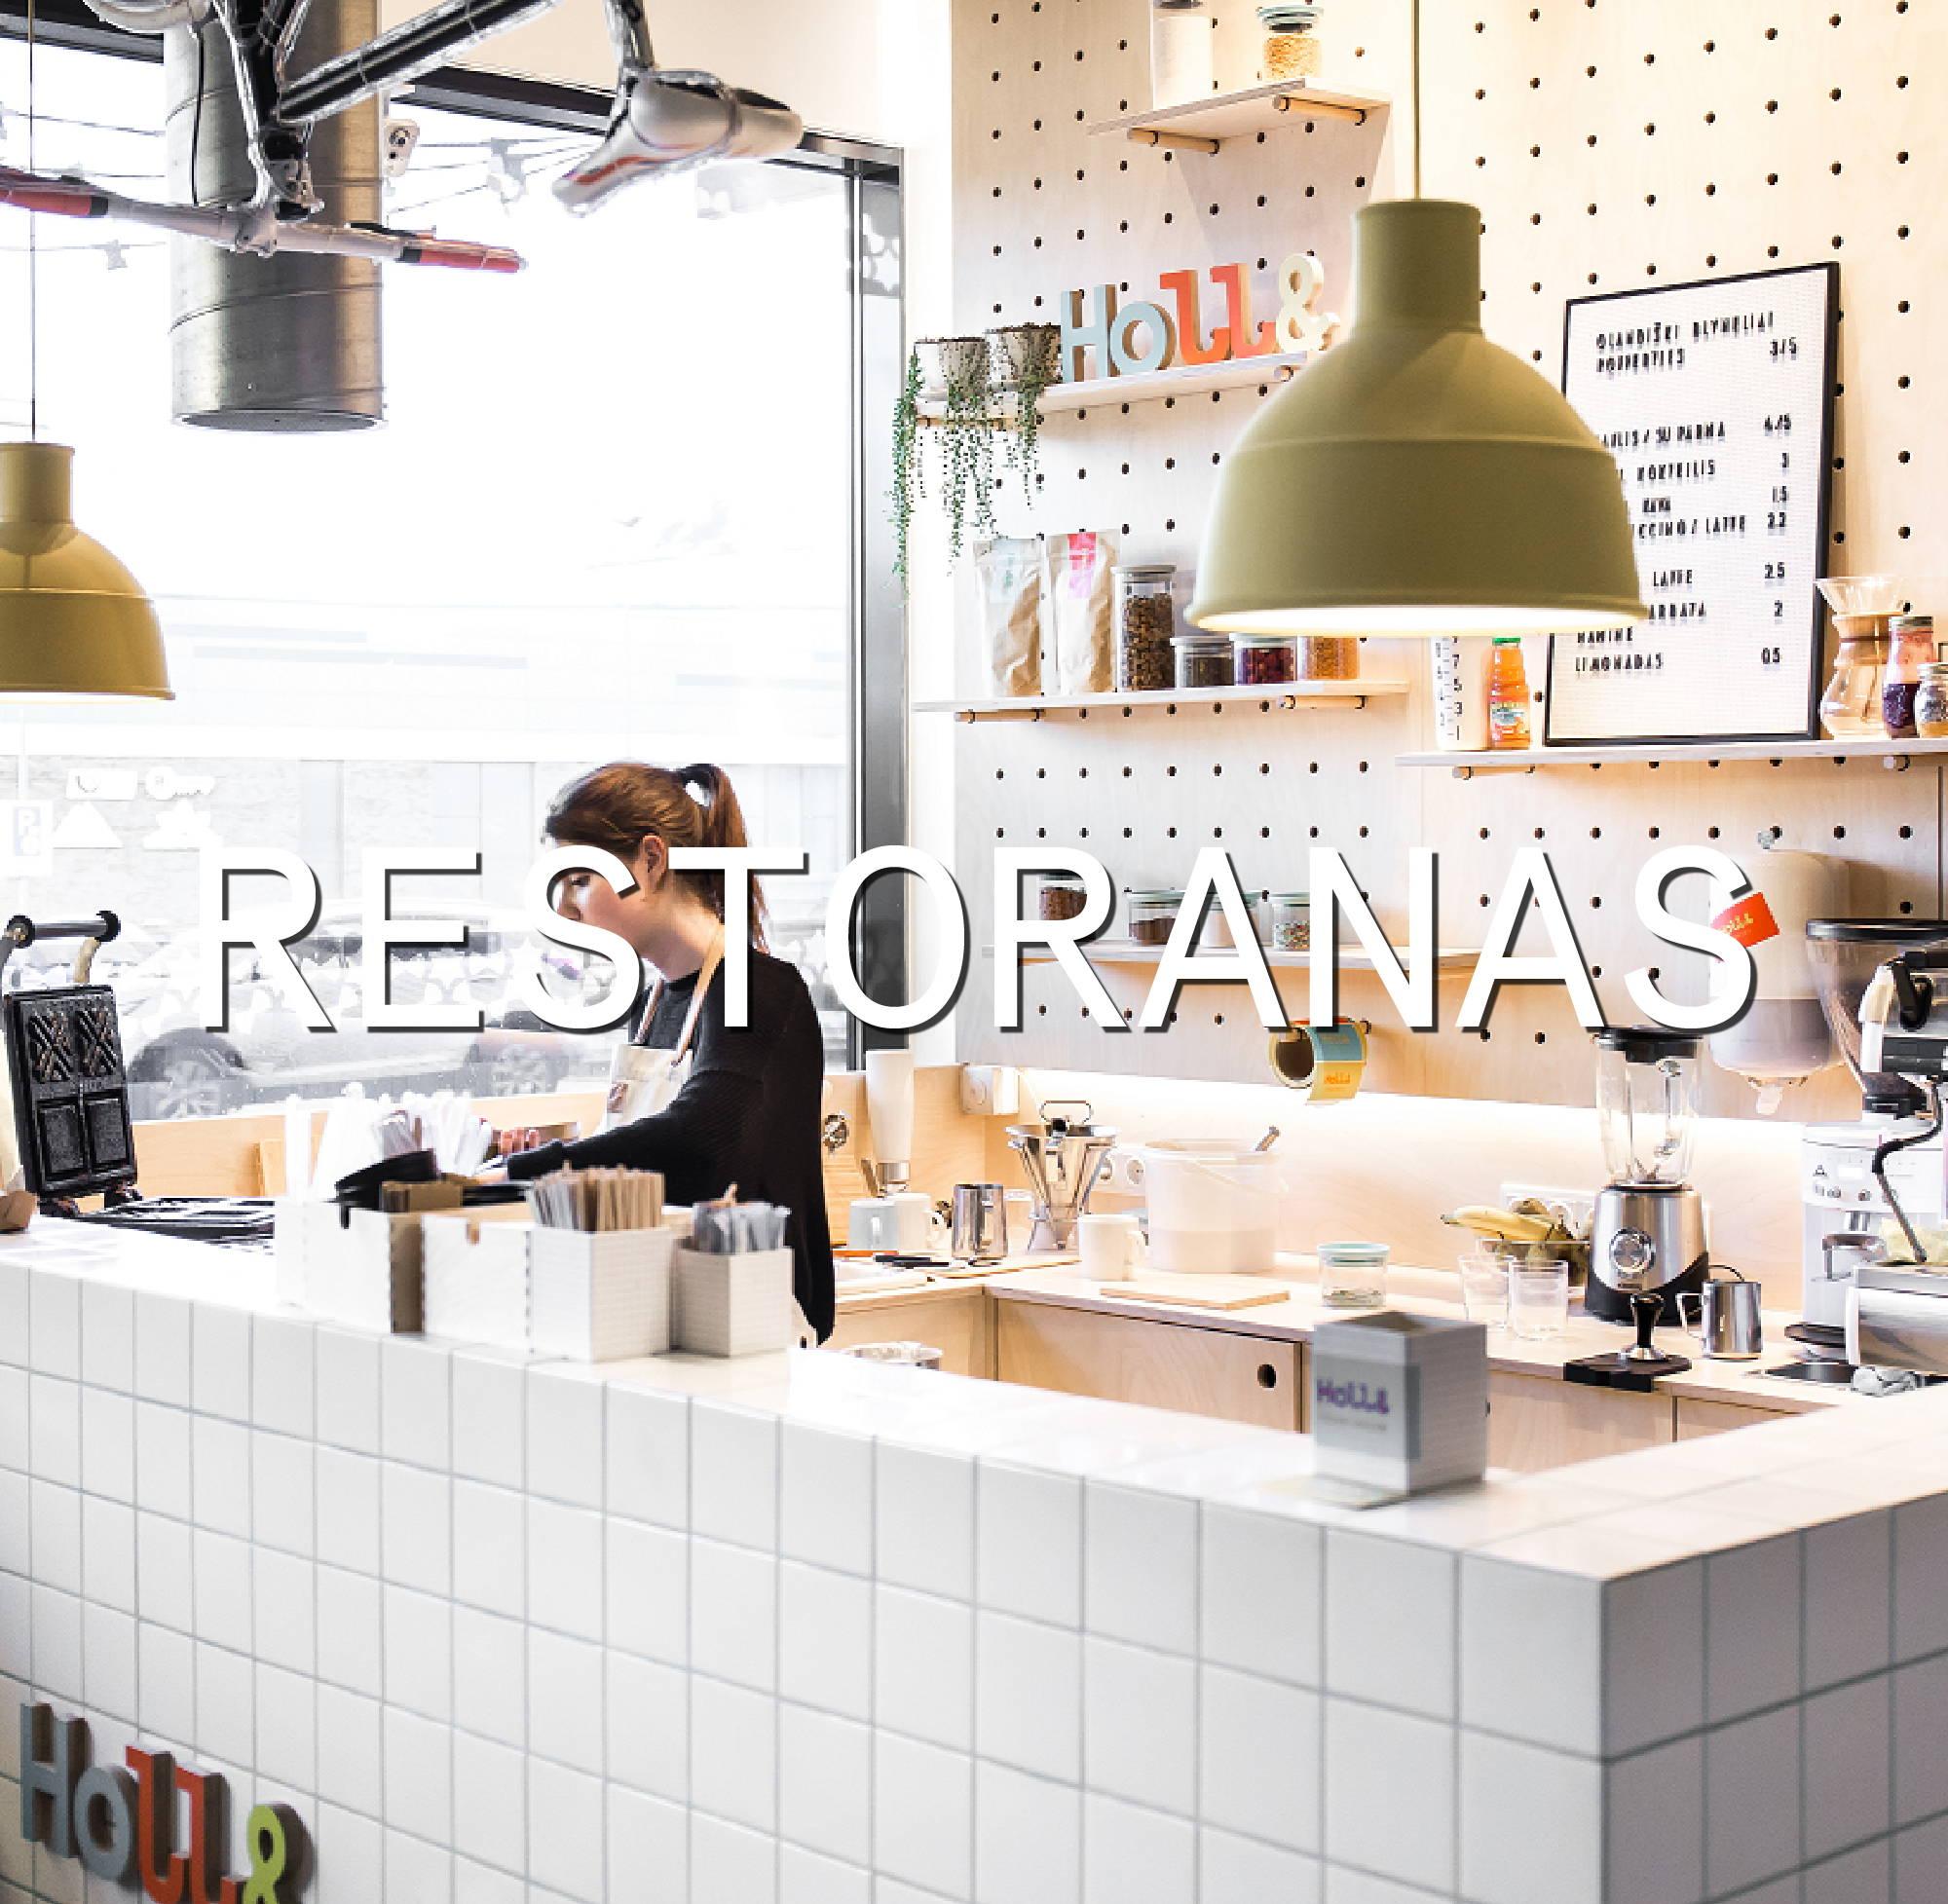 Holl& Pancakes Restoranas Vilniuje